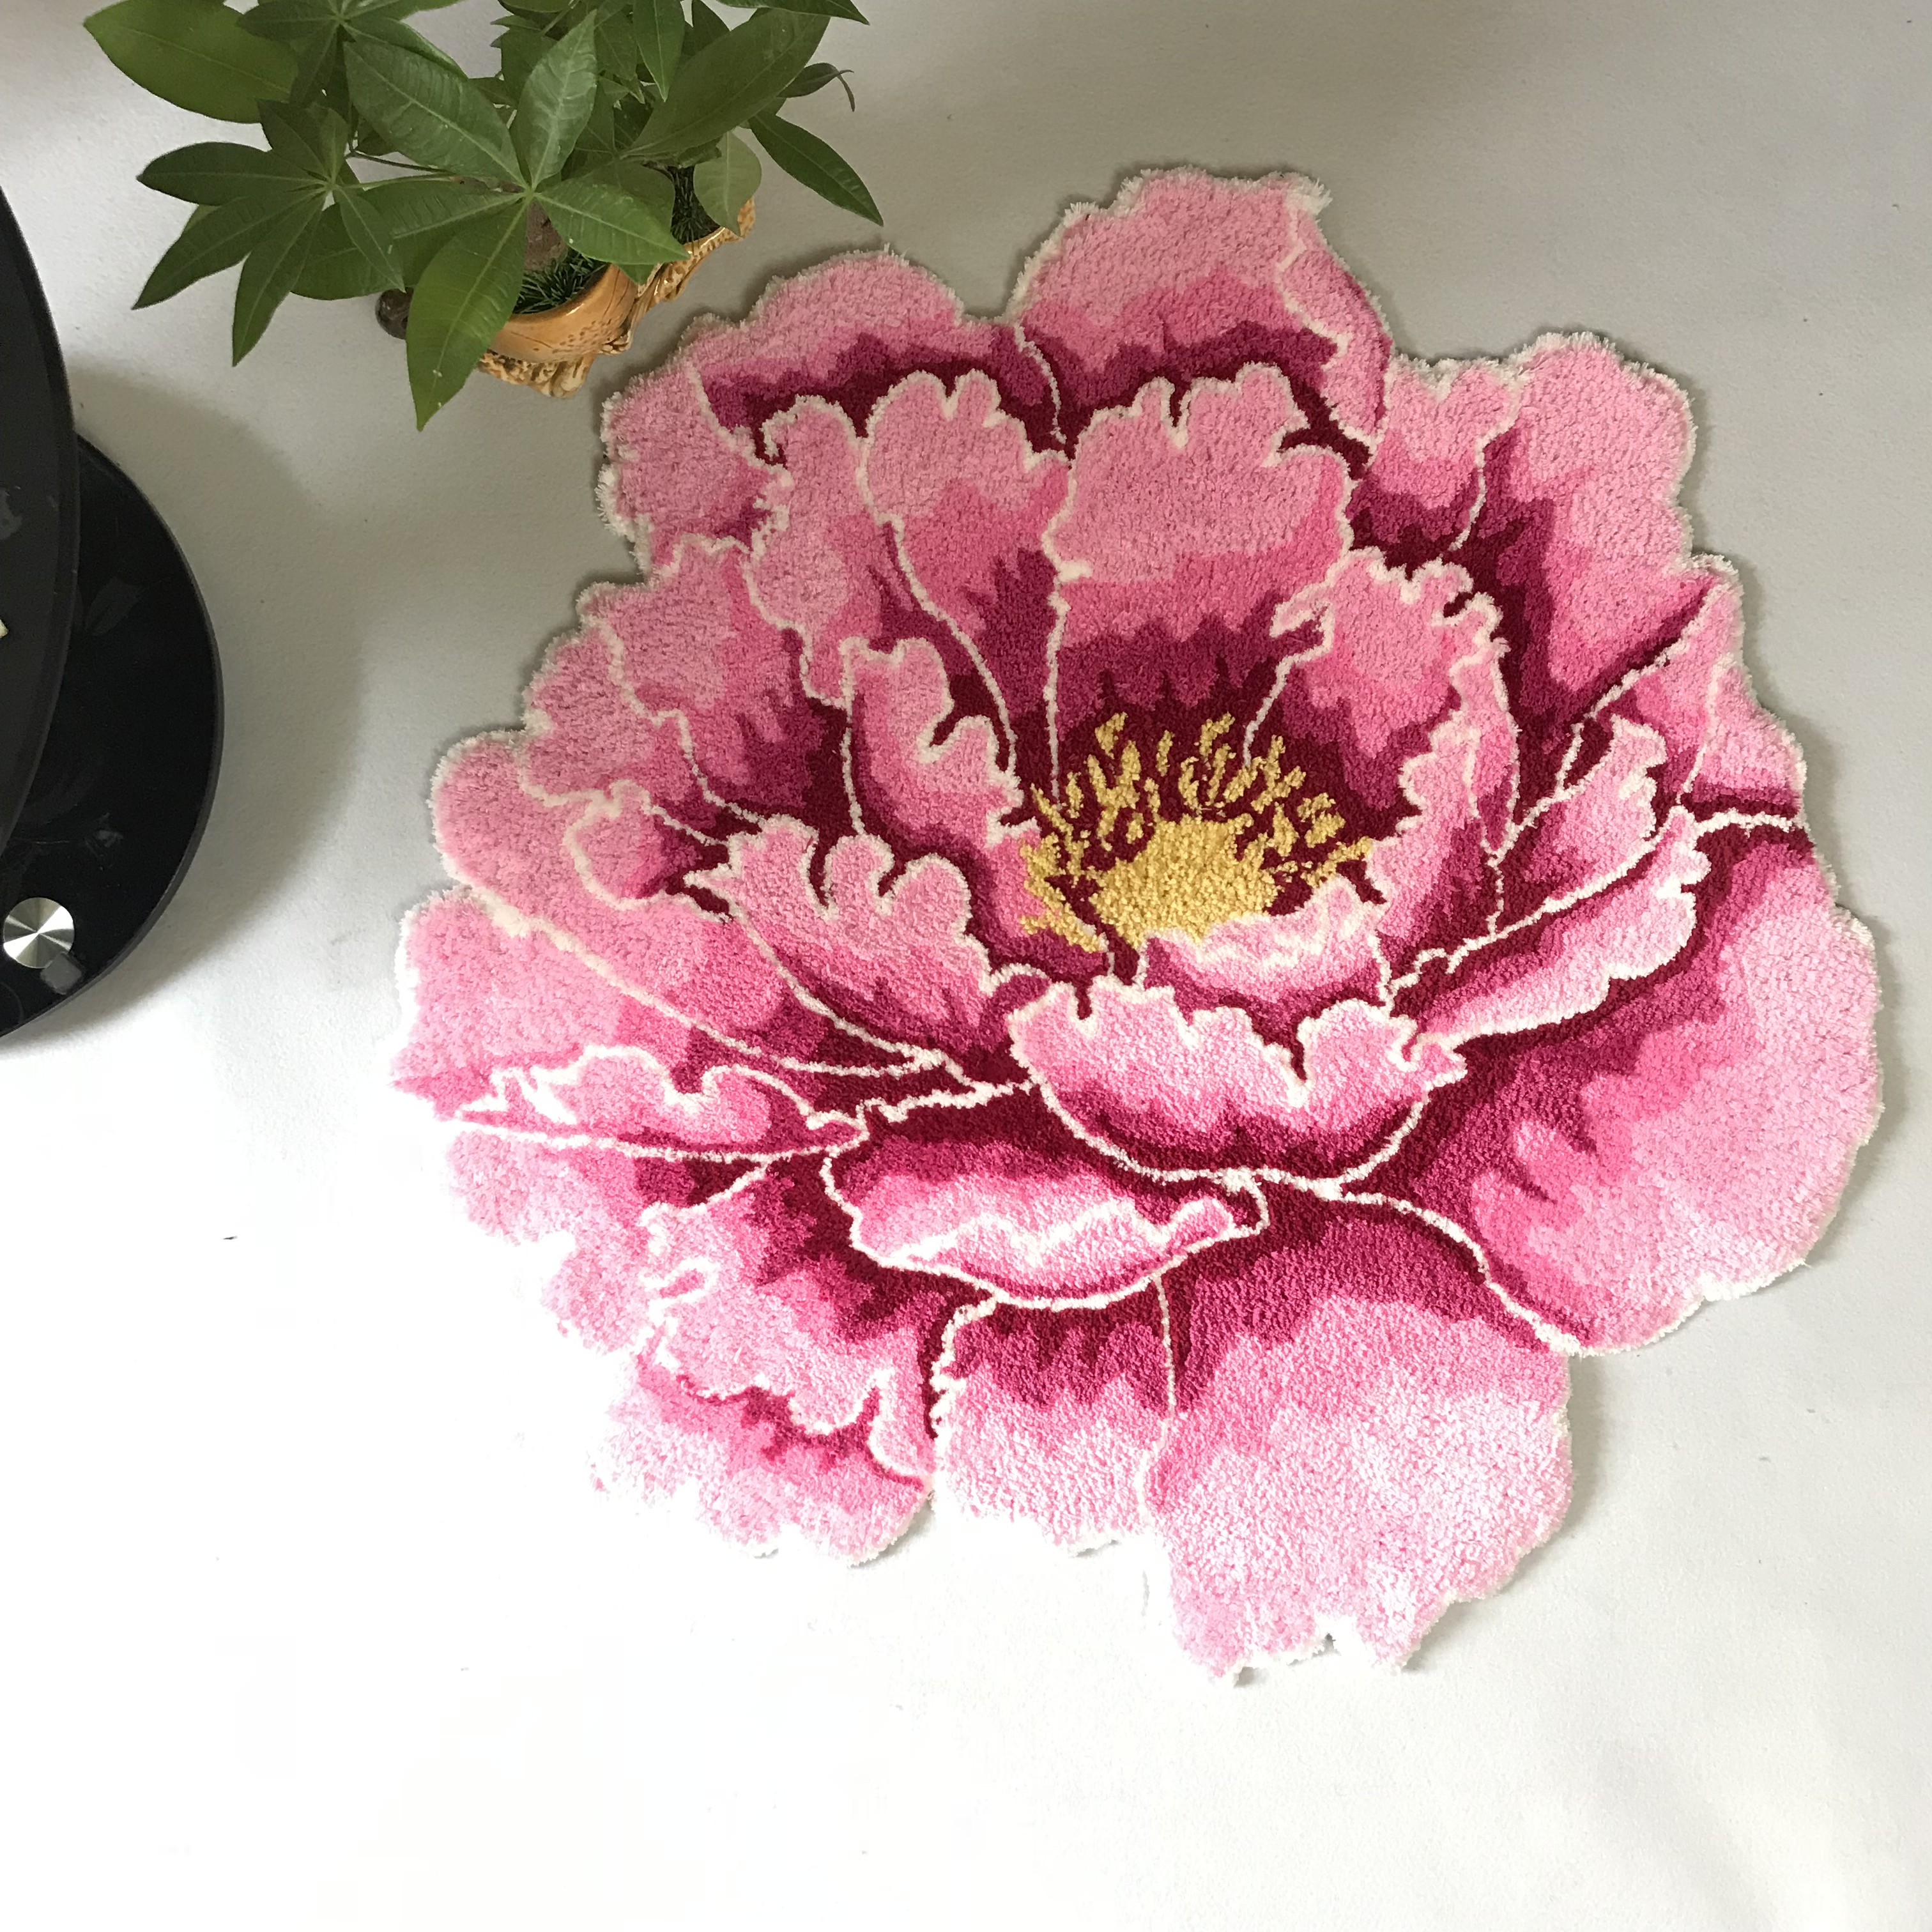 3D Peony Thick Flower Carpet Bedroom Livingroom Round Rug Bed Soft Parlor Pink Rug Anti-slip Hallway Chair Kids Door Mat